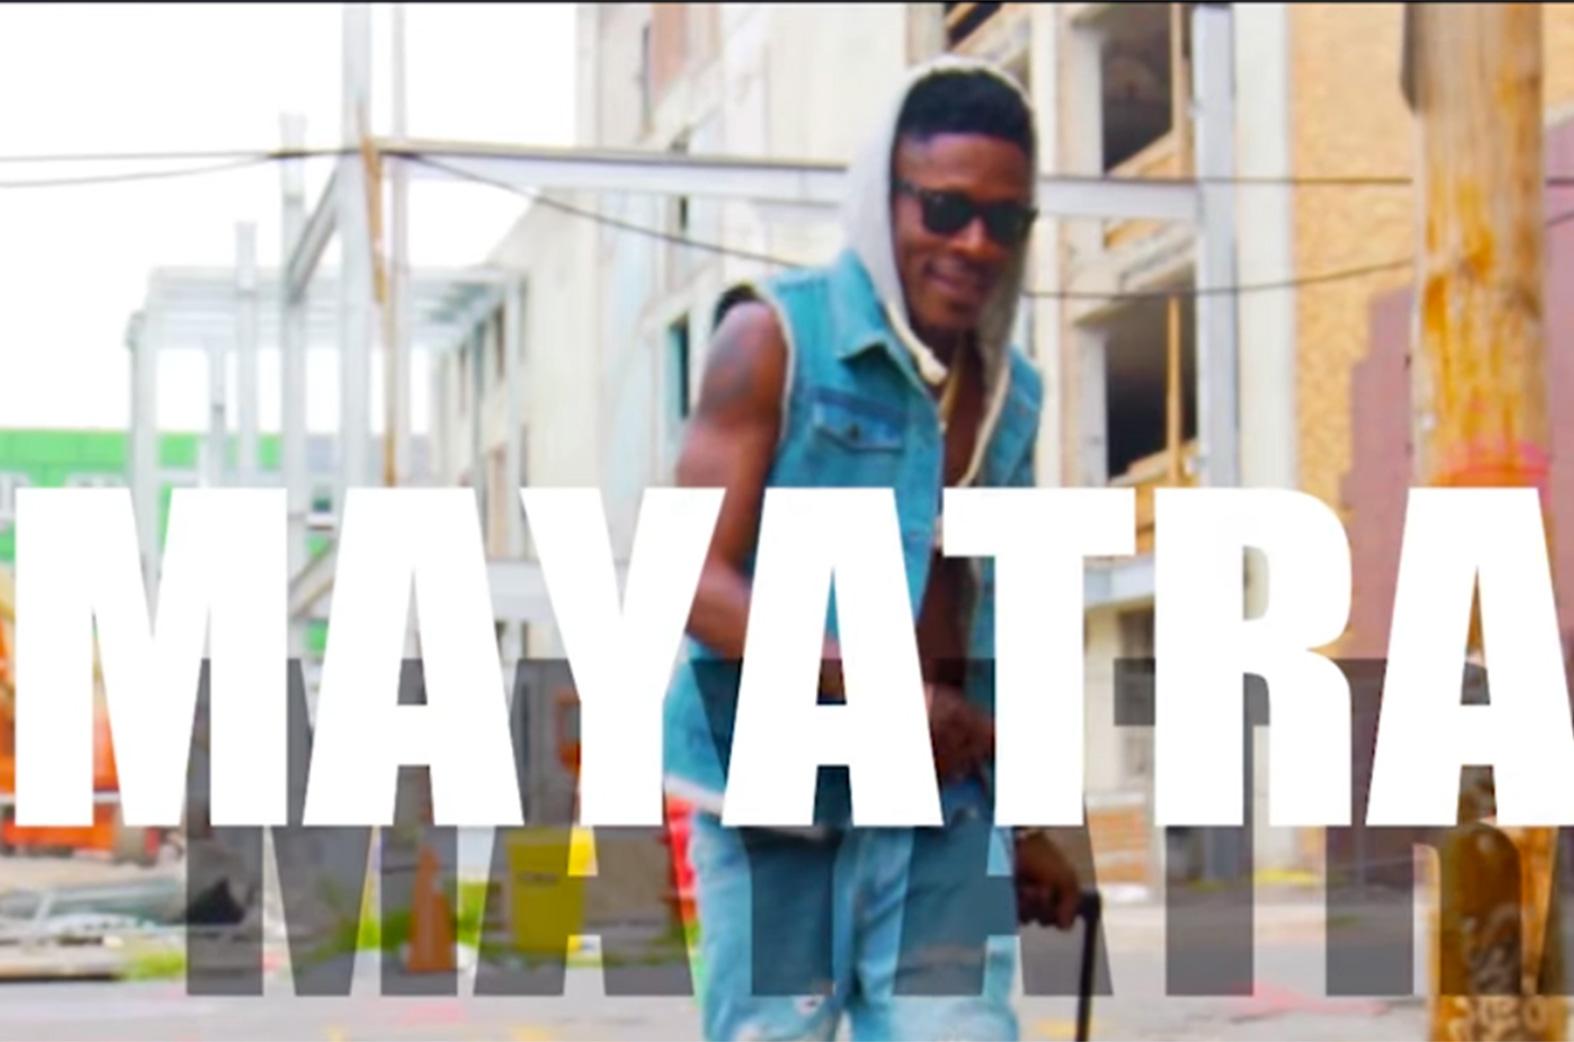 Mayatra by Shatta Wale feat. Pope Skinny